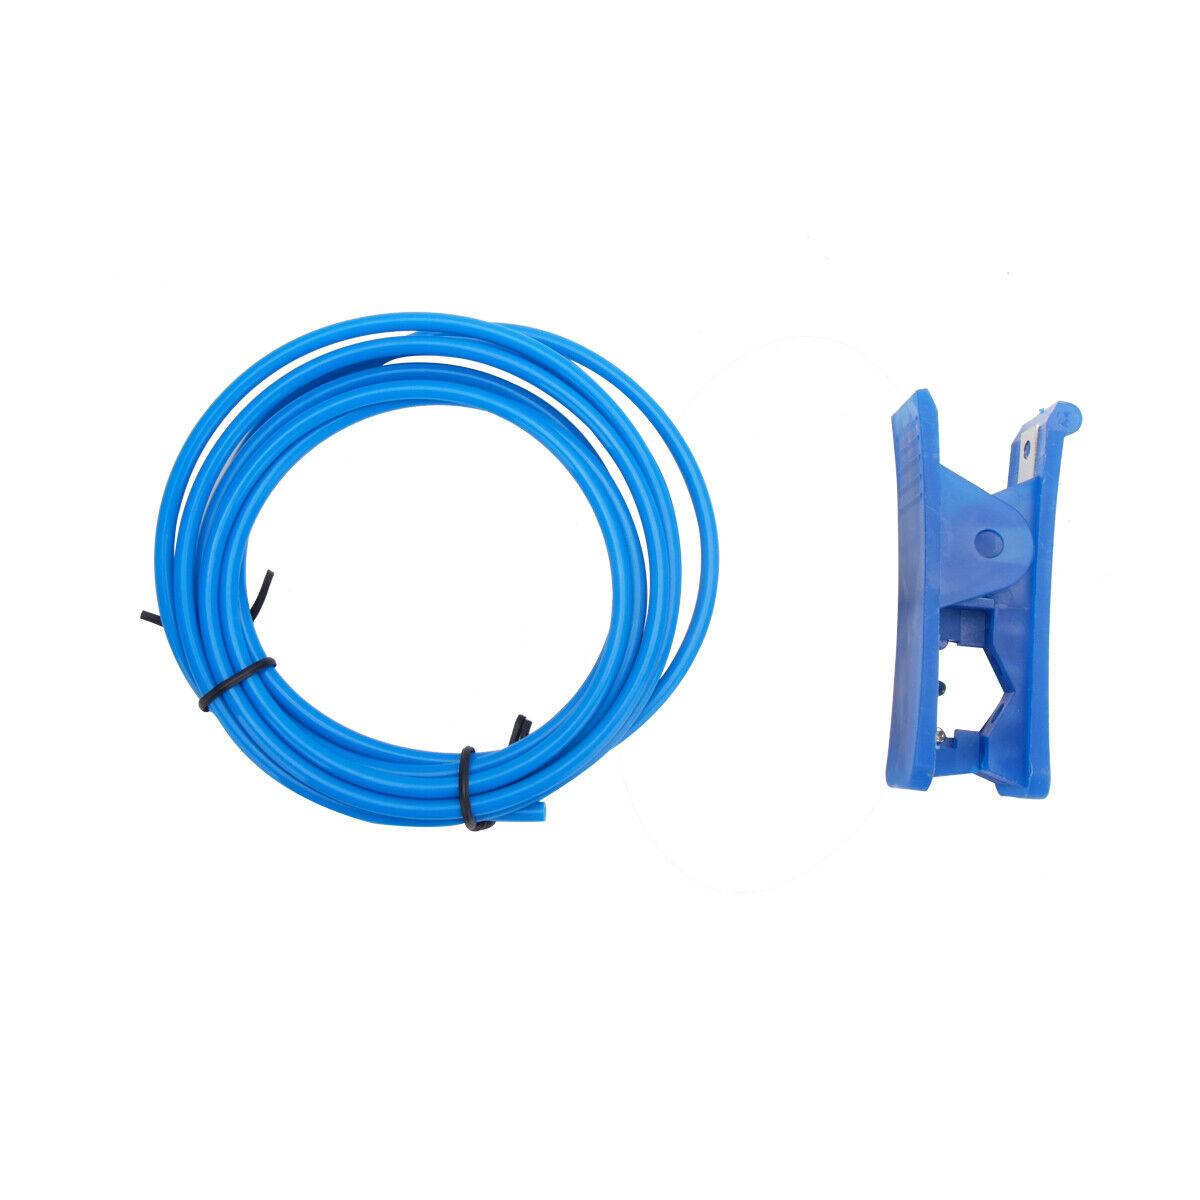 Capricorn-clon ID 1.9mm para 1.75mm azul 1 metros Bowden ptfe-Tube//manguera